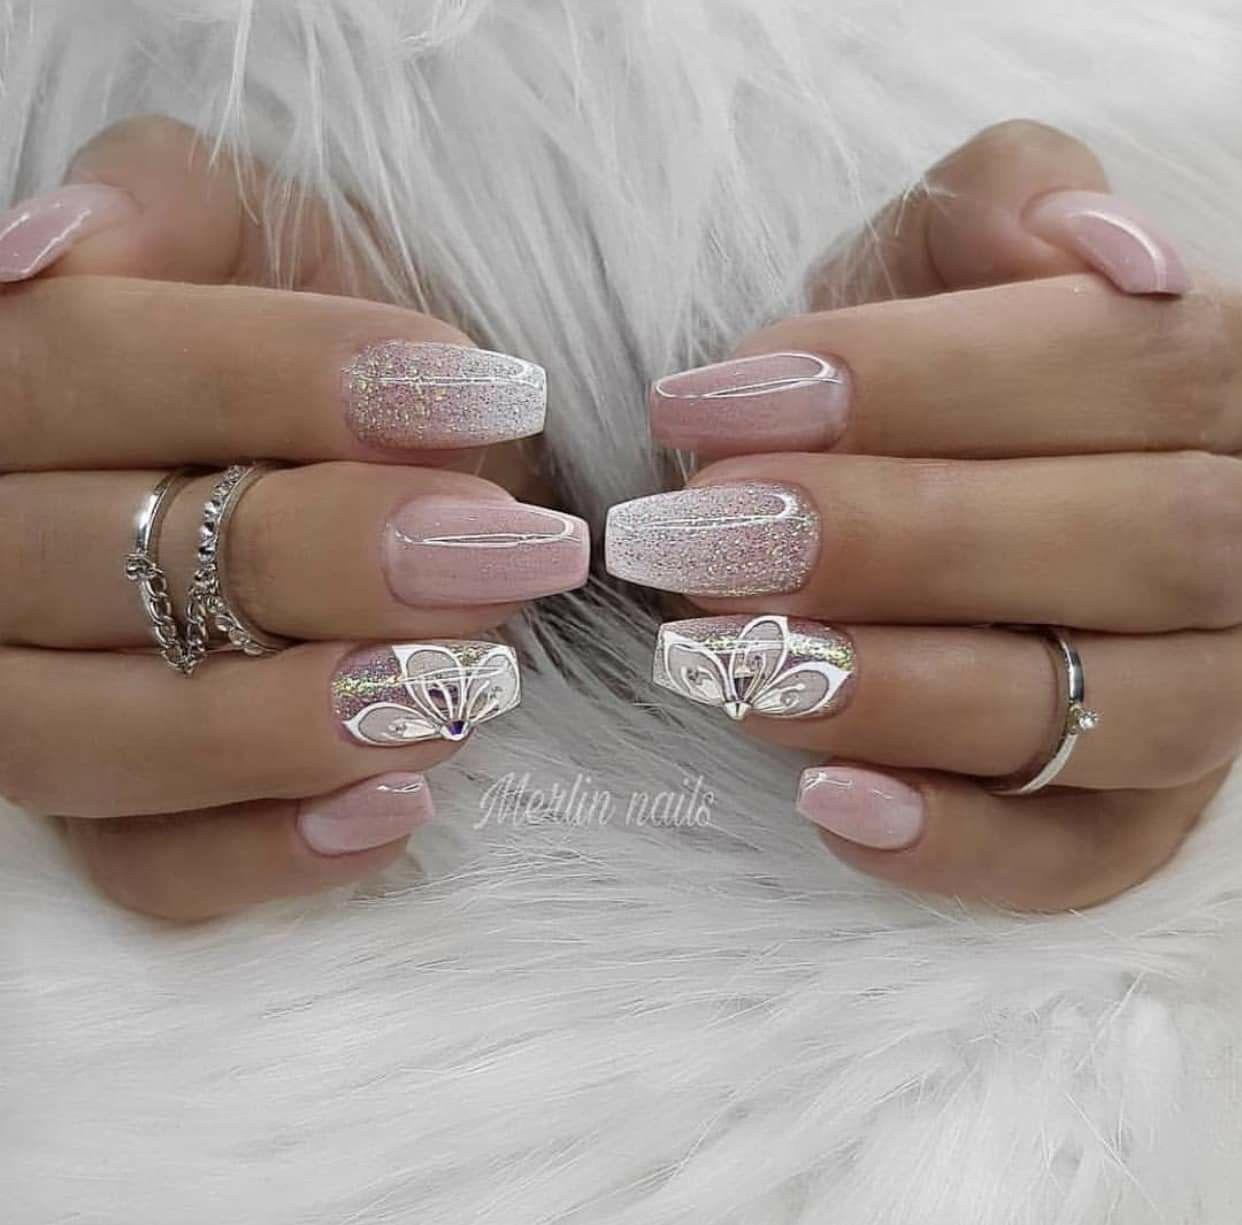 Pin By Rashelle Statczar On Nails Elegant Nails Nail Designs Pink Nails